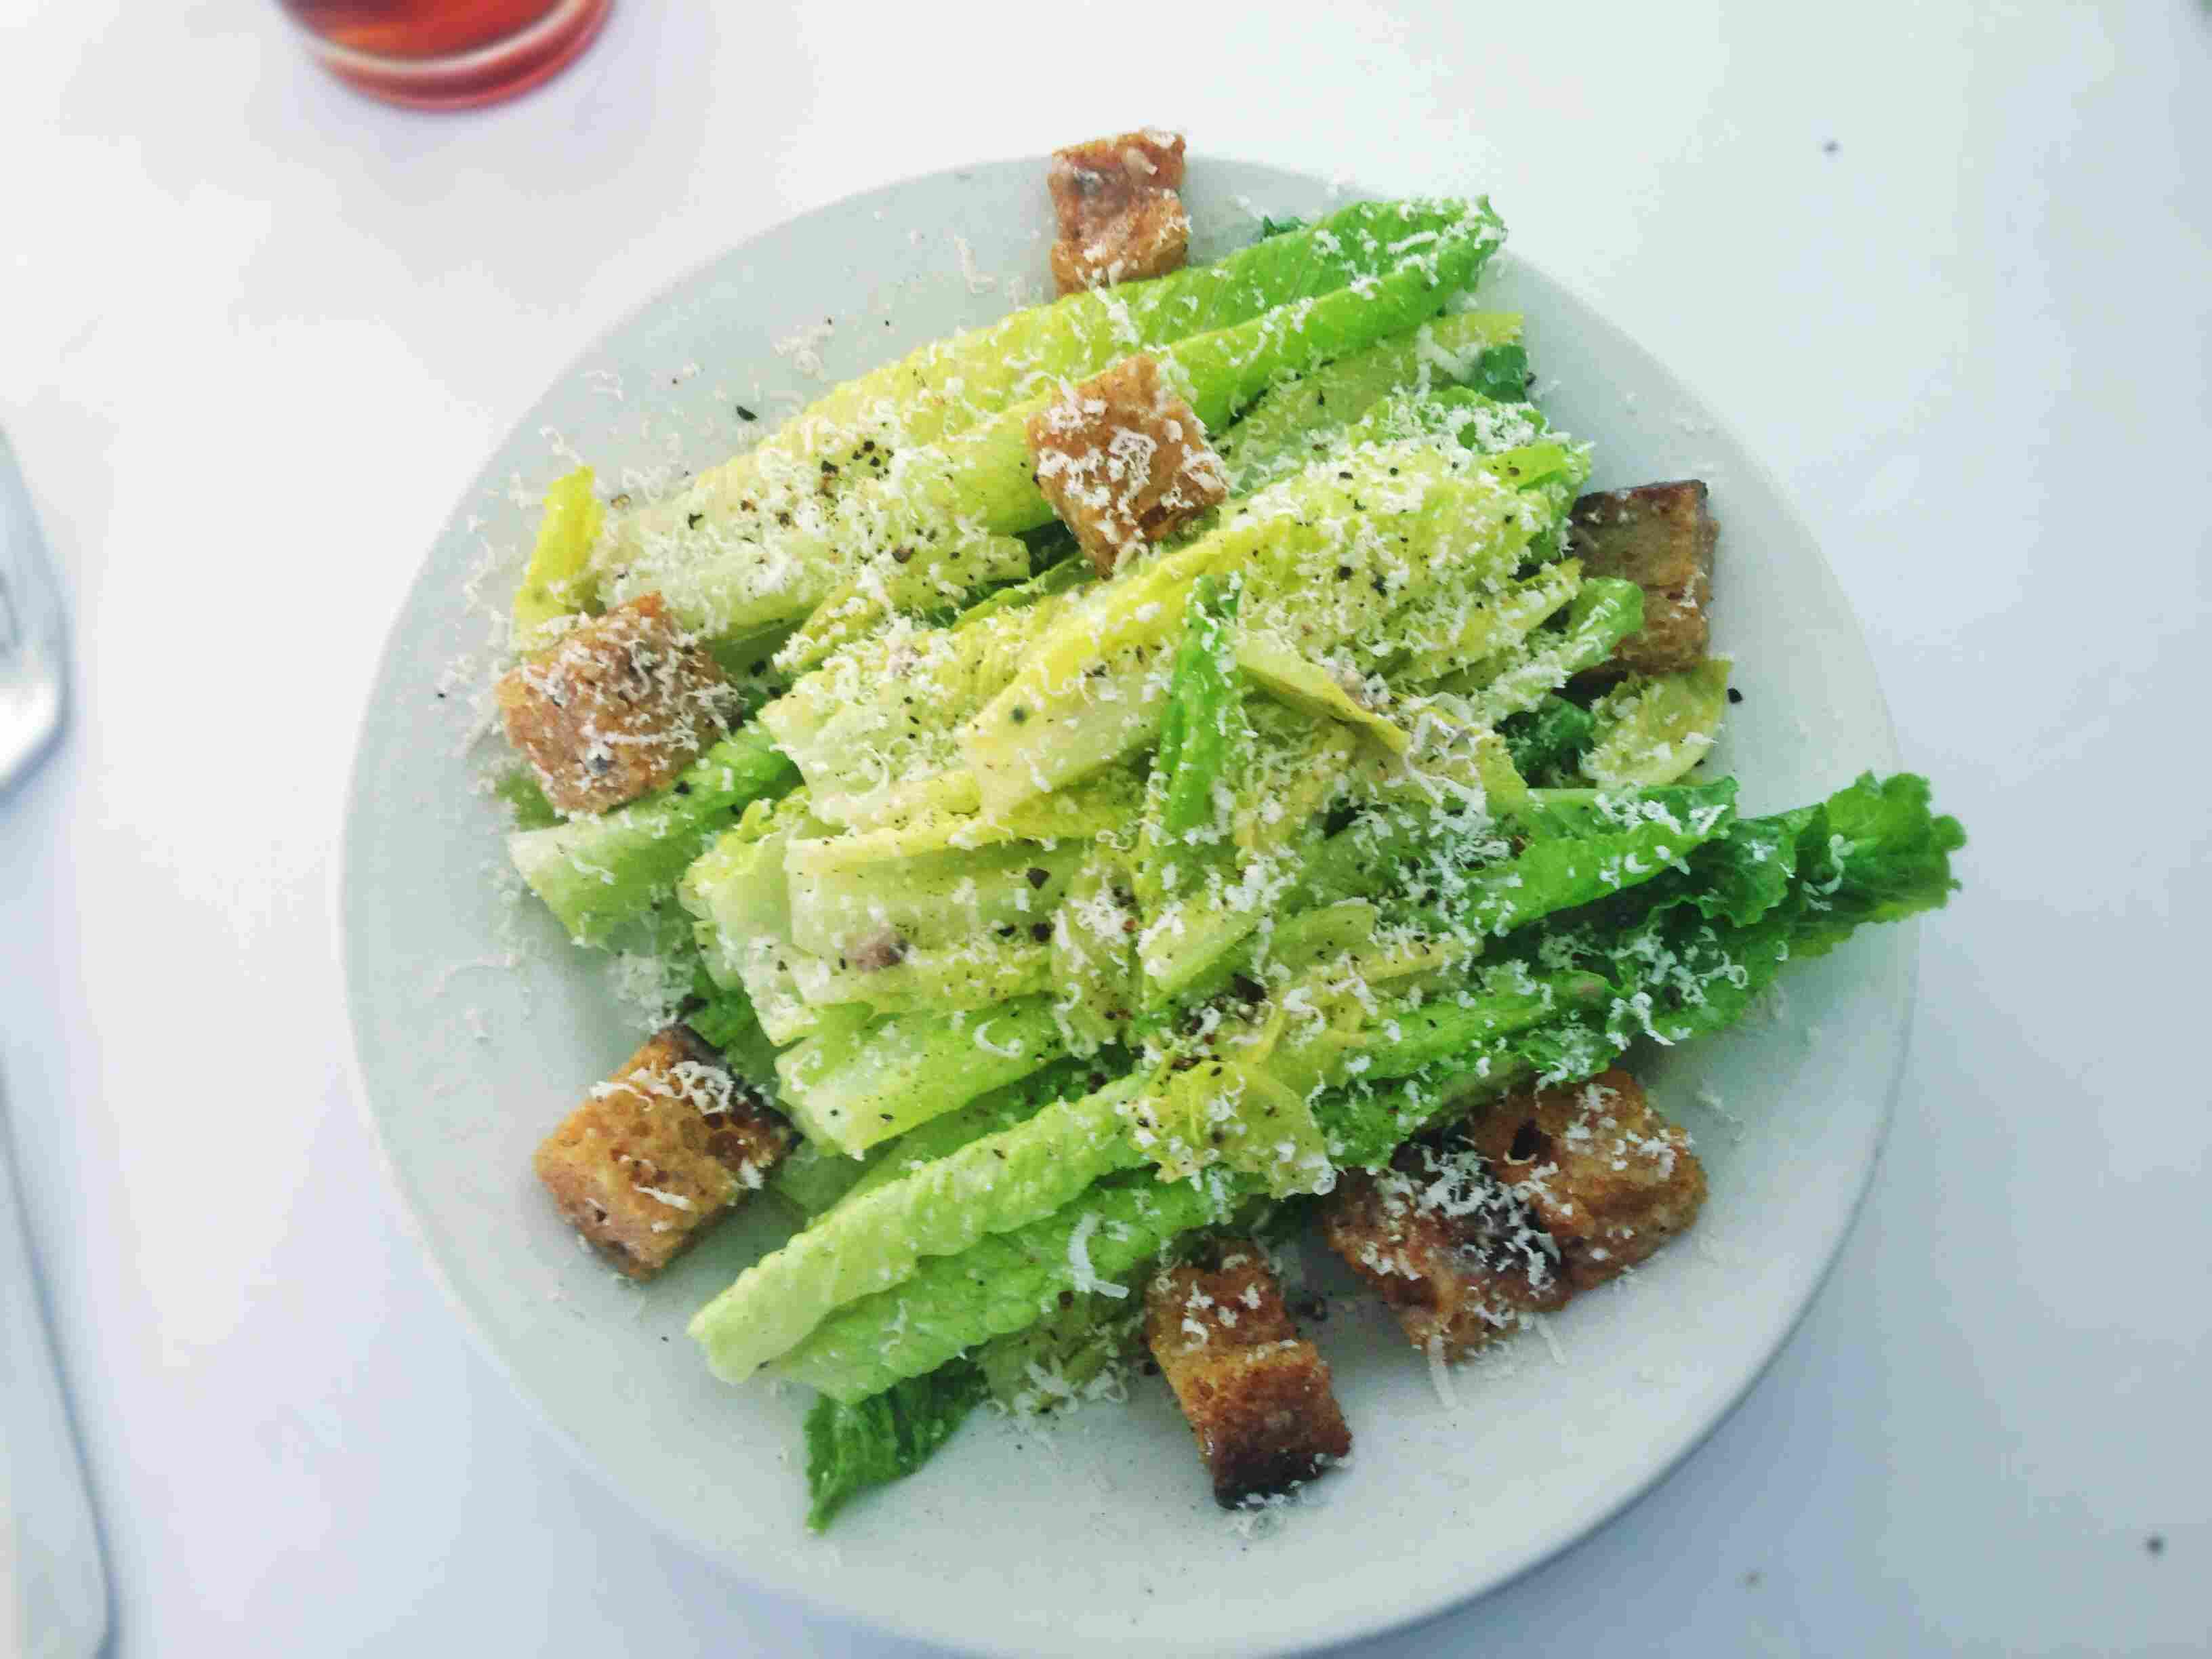 Zuni caesar salad